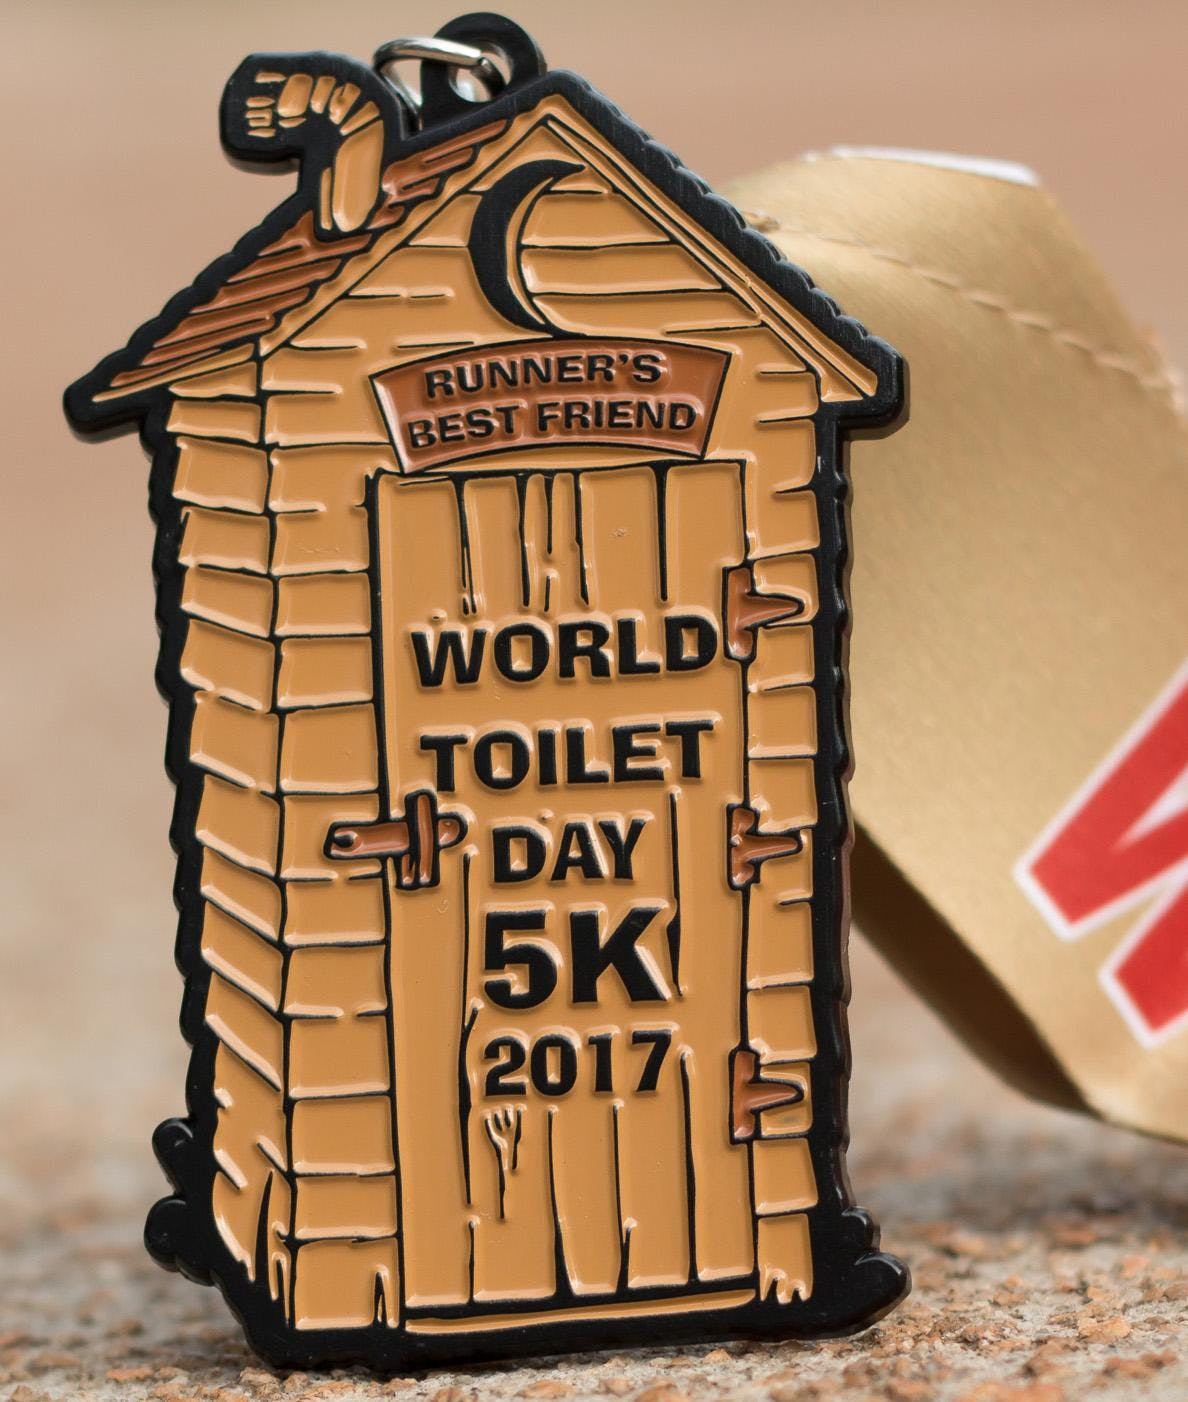 Now Only $8.00! World Toilet Day 5K - Huntington Beach